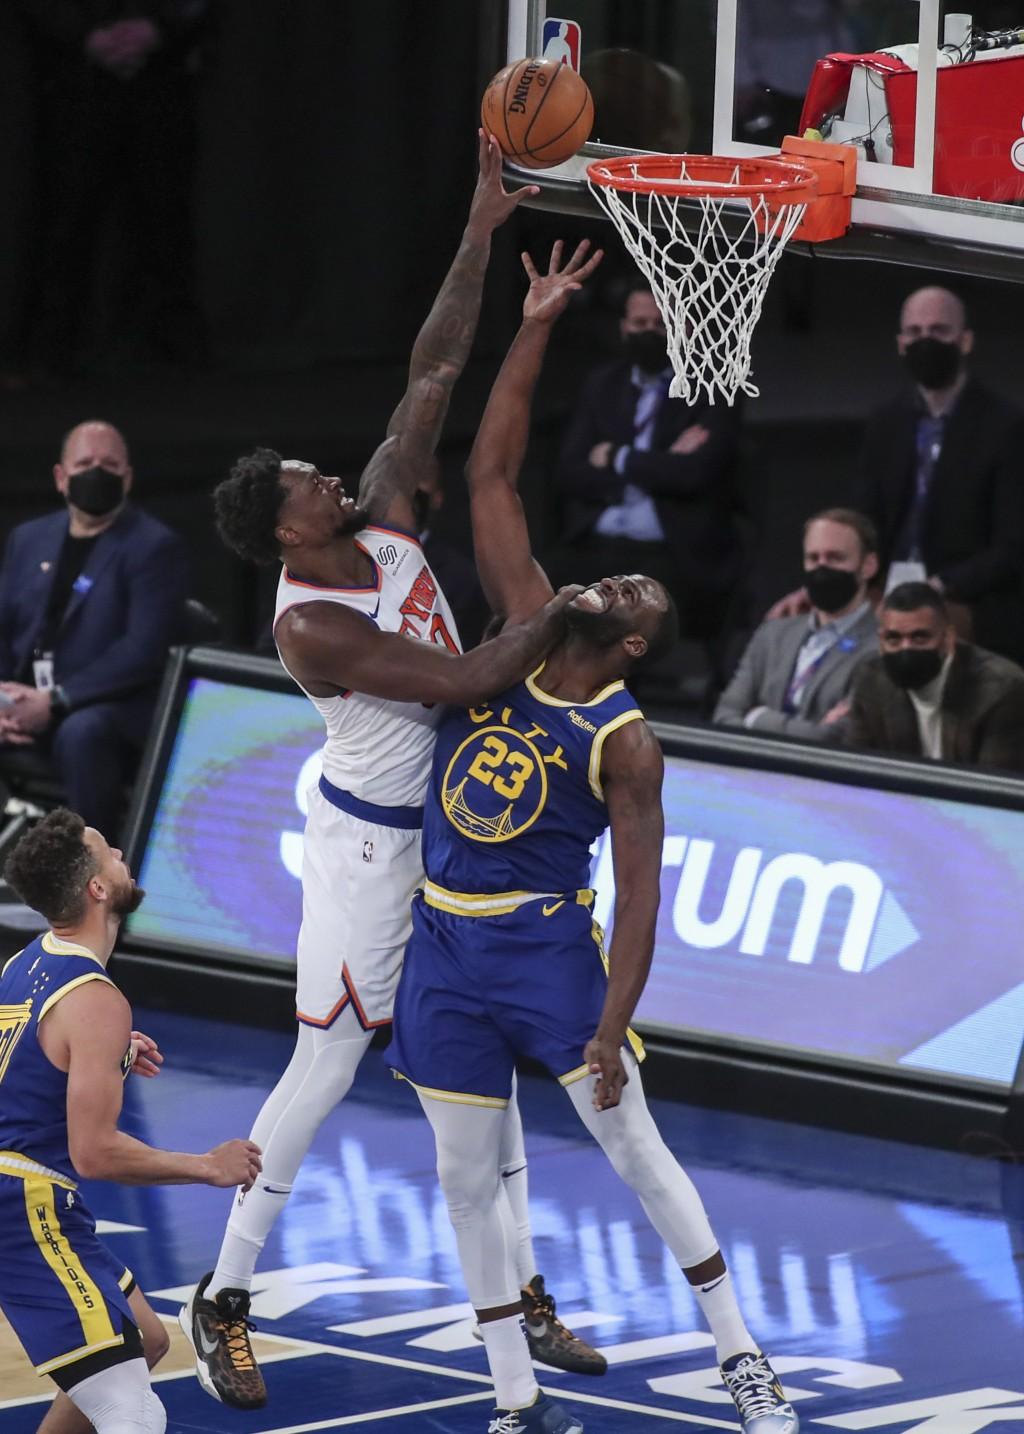 New York Knicks forward Julius Randle shoots over Golden State Warriors forward Draymond Green (23) during the second quarter of an NBA basketball gam...